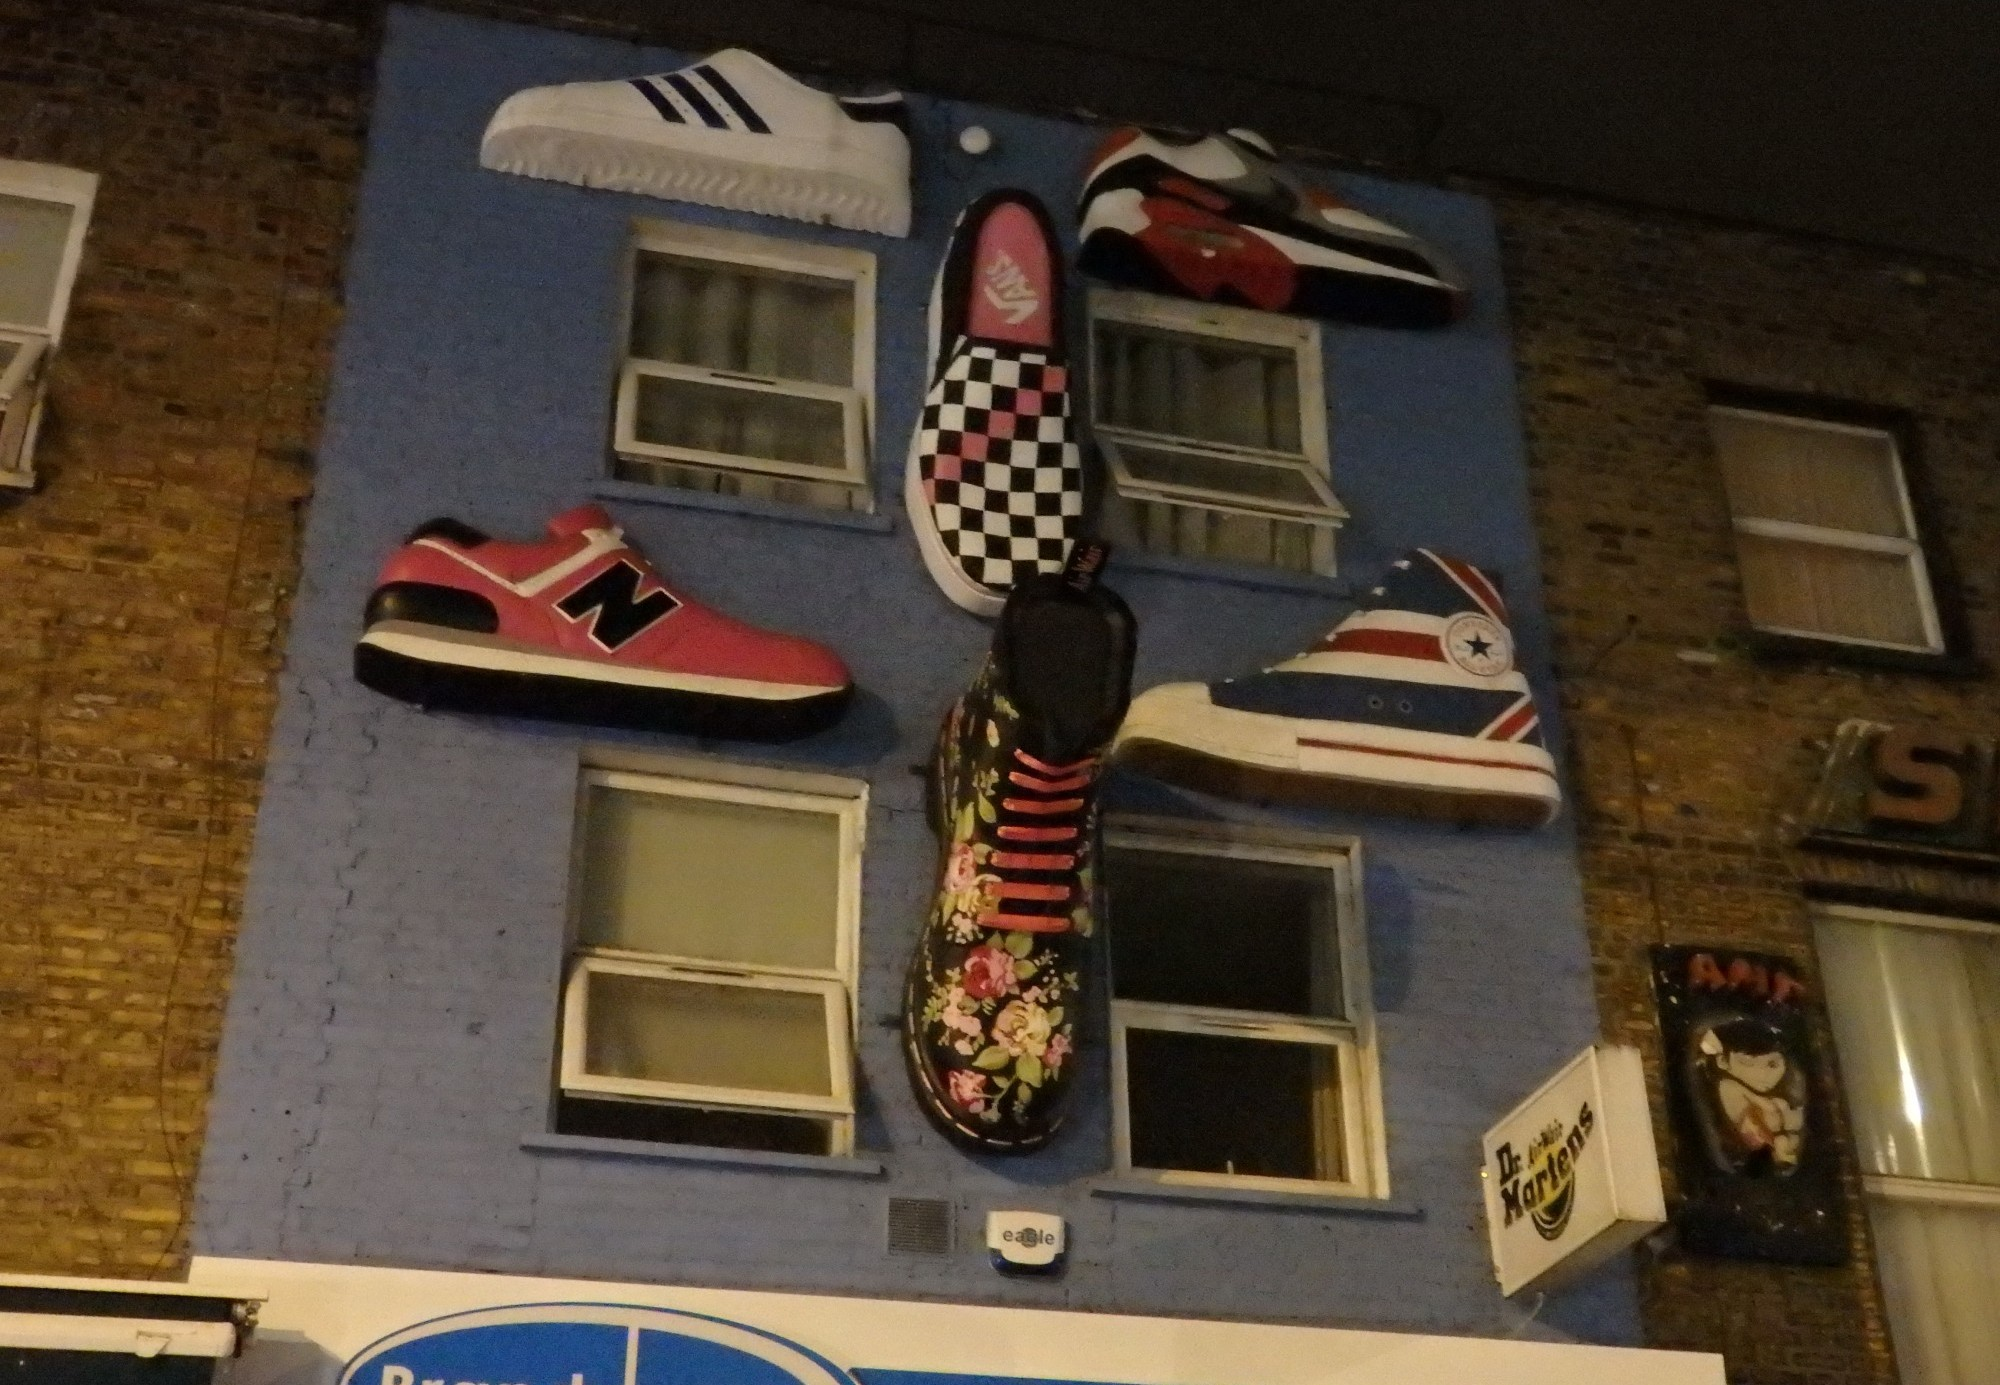 three-dimensional street art in Shoreditch, London